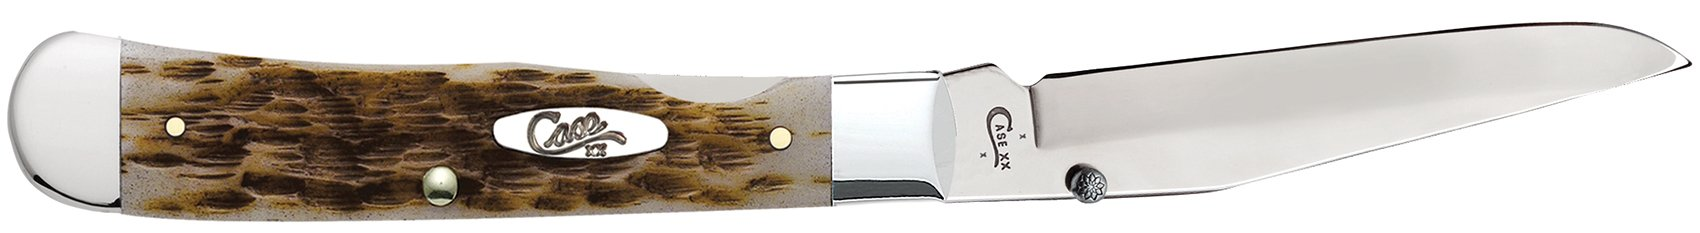 Case Amber Bone CV Trapperlock Pocket Knife with Clip by Case (Image #4)